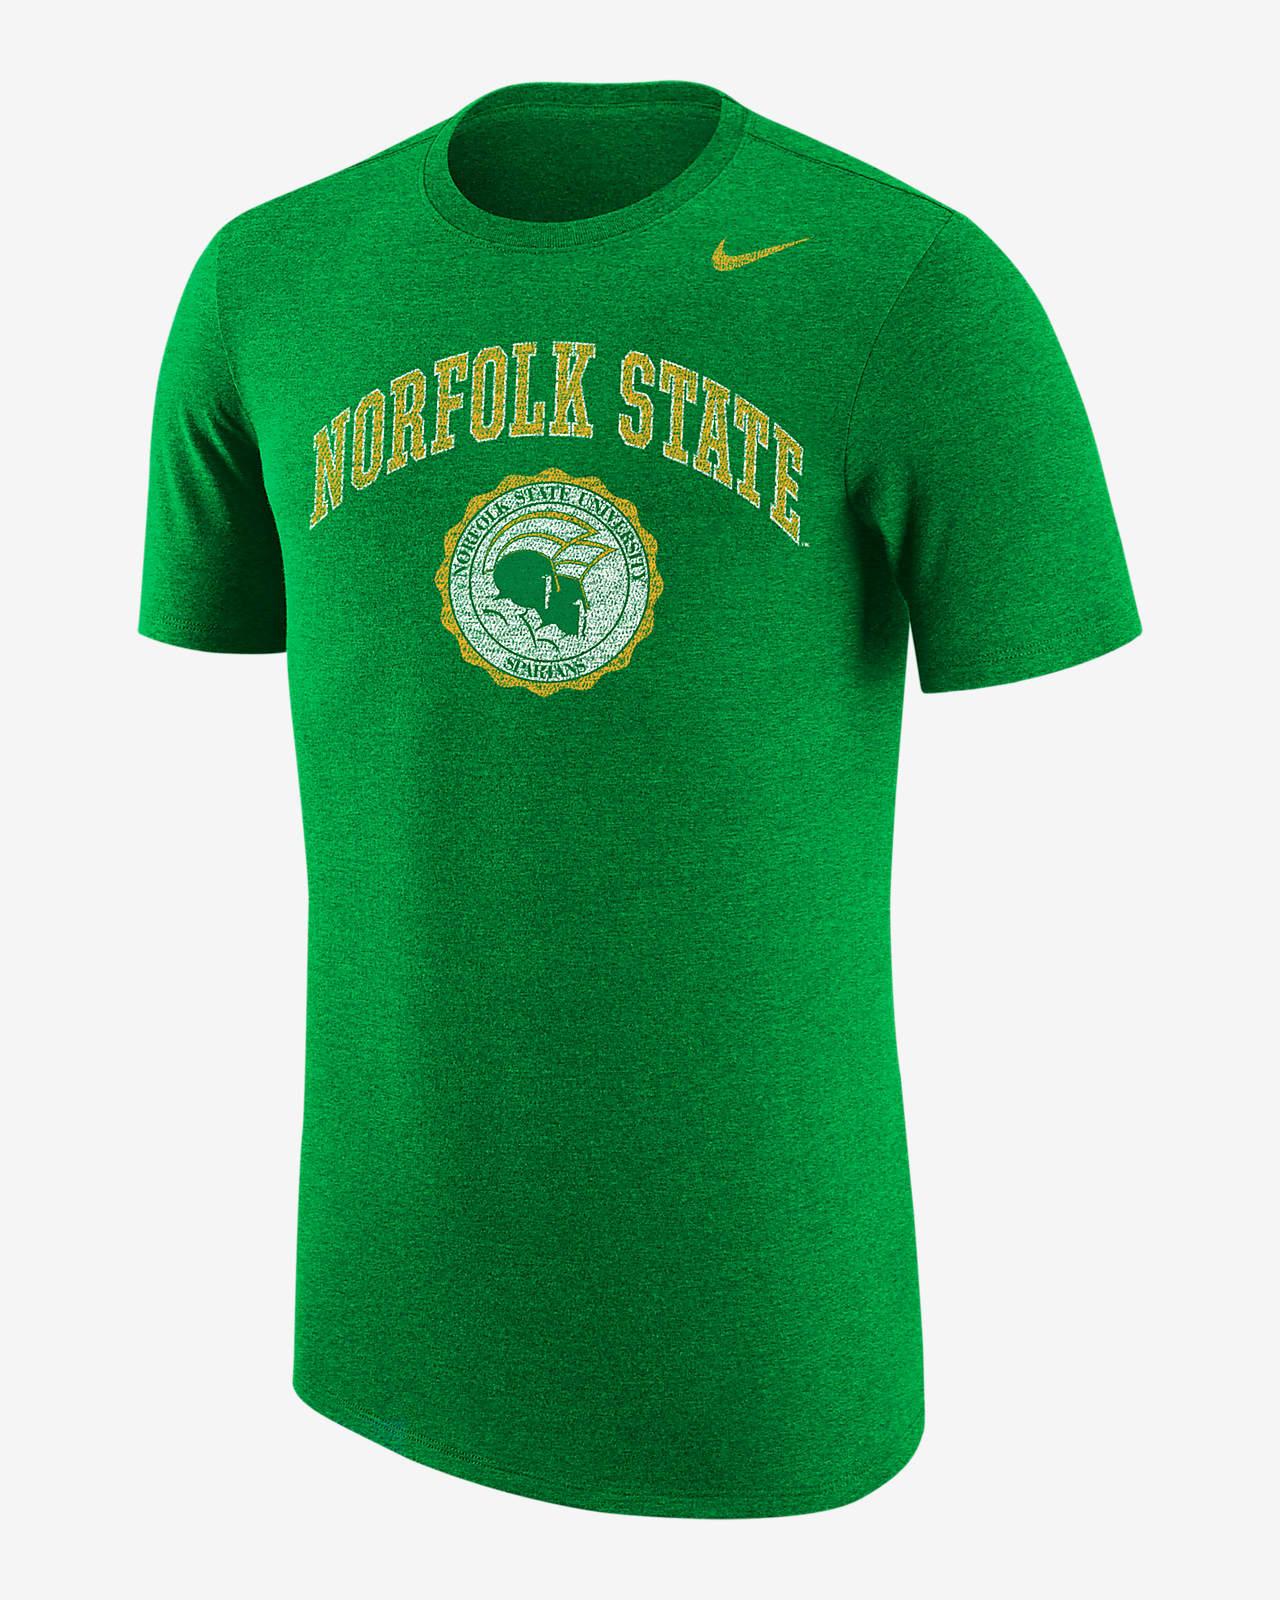 Nike College (Norfolk State) Men's T-Shirt